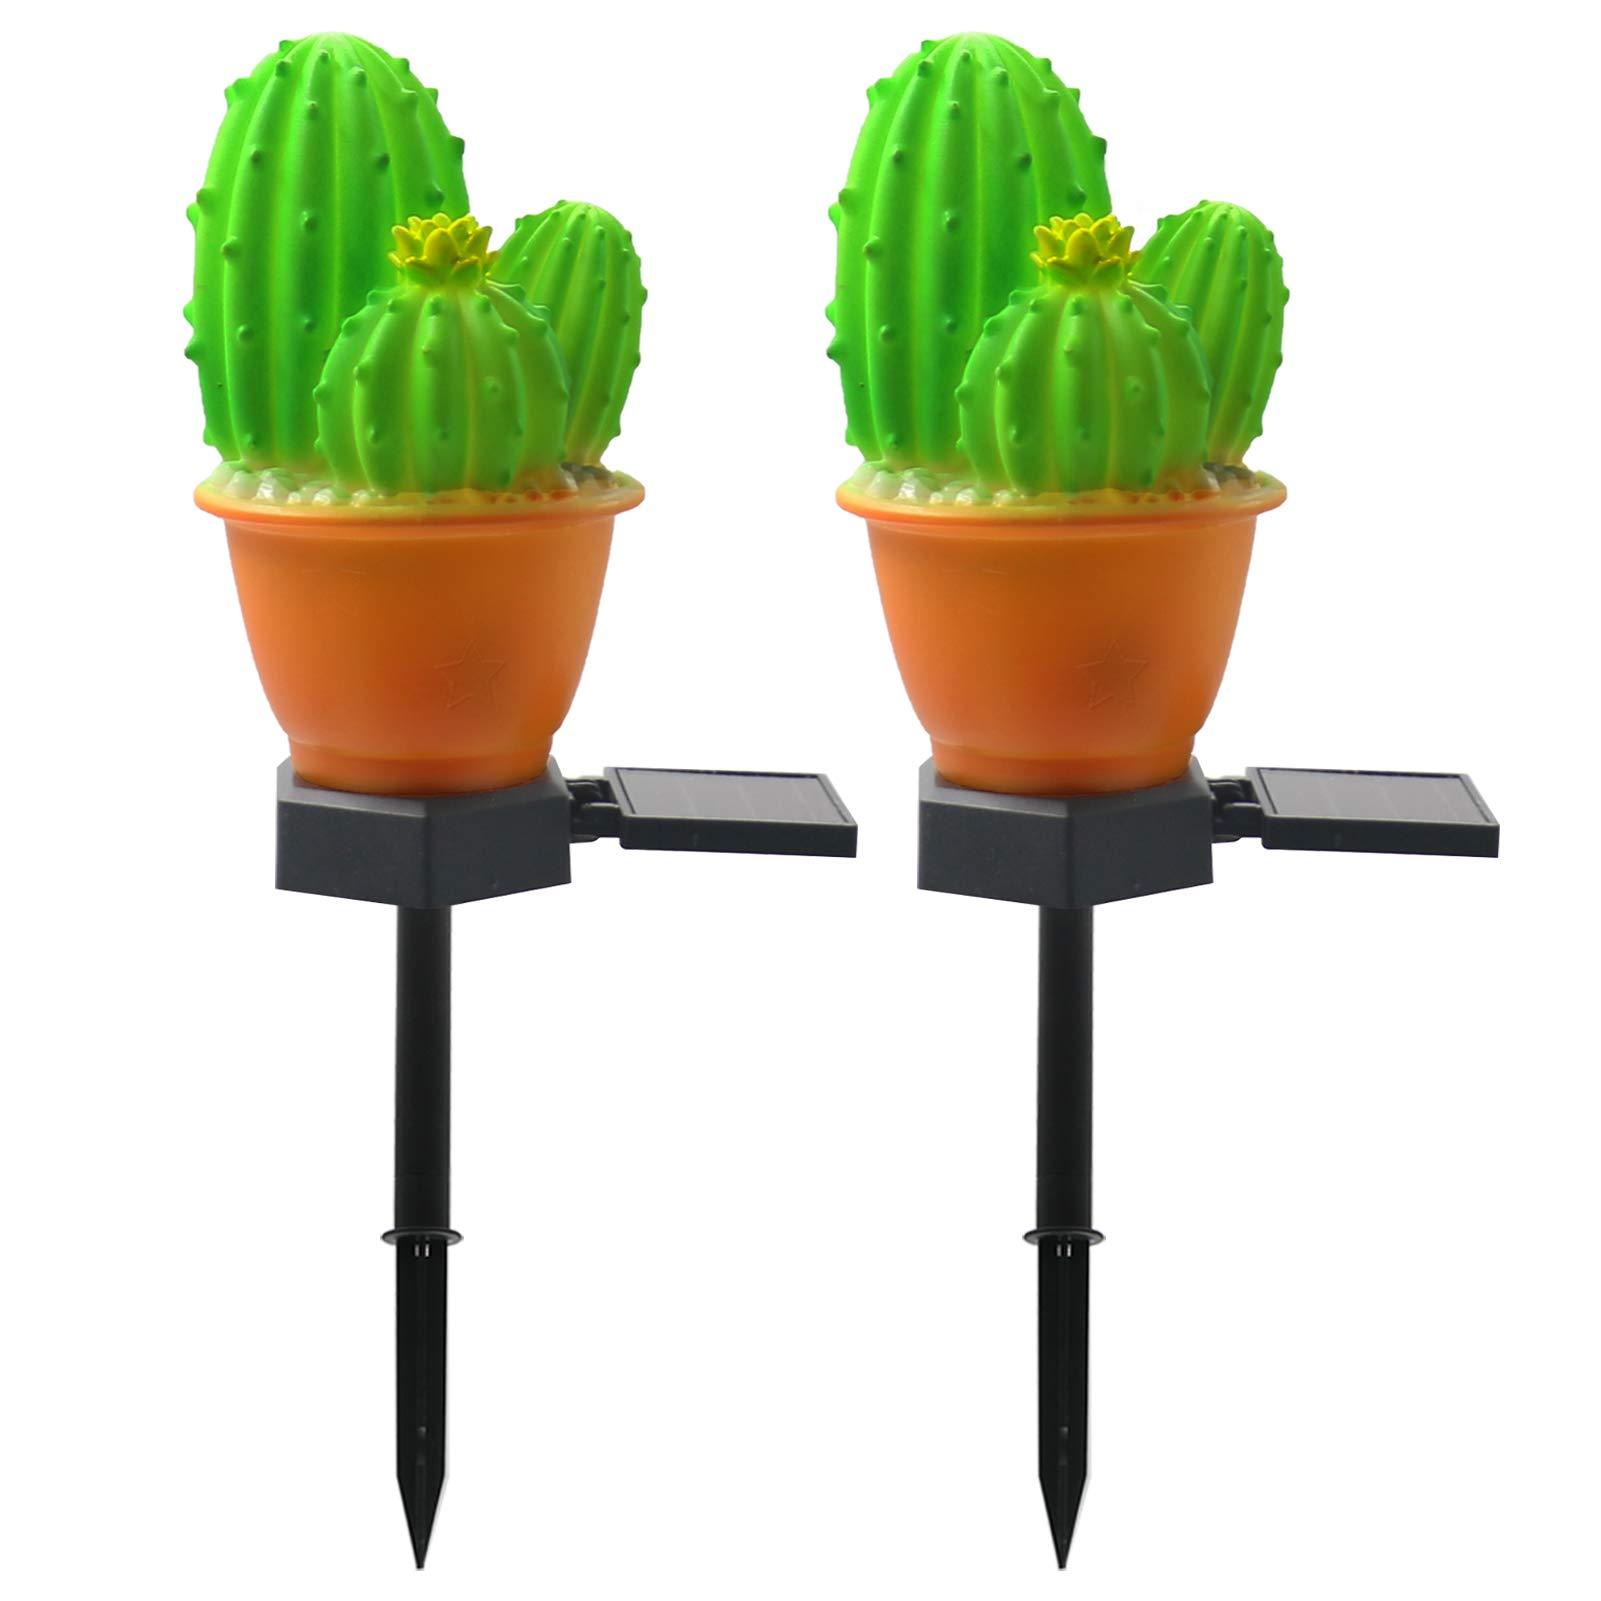 VGYVGYCC Garden Decor Solar Lights Outdoor – 2 Pack Cactus Stake Waterproof